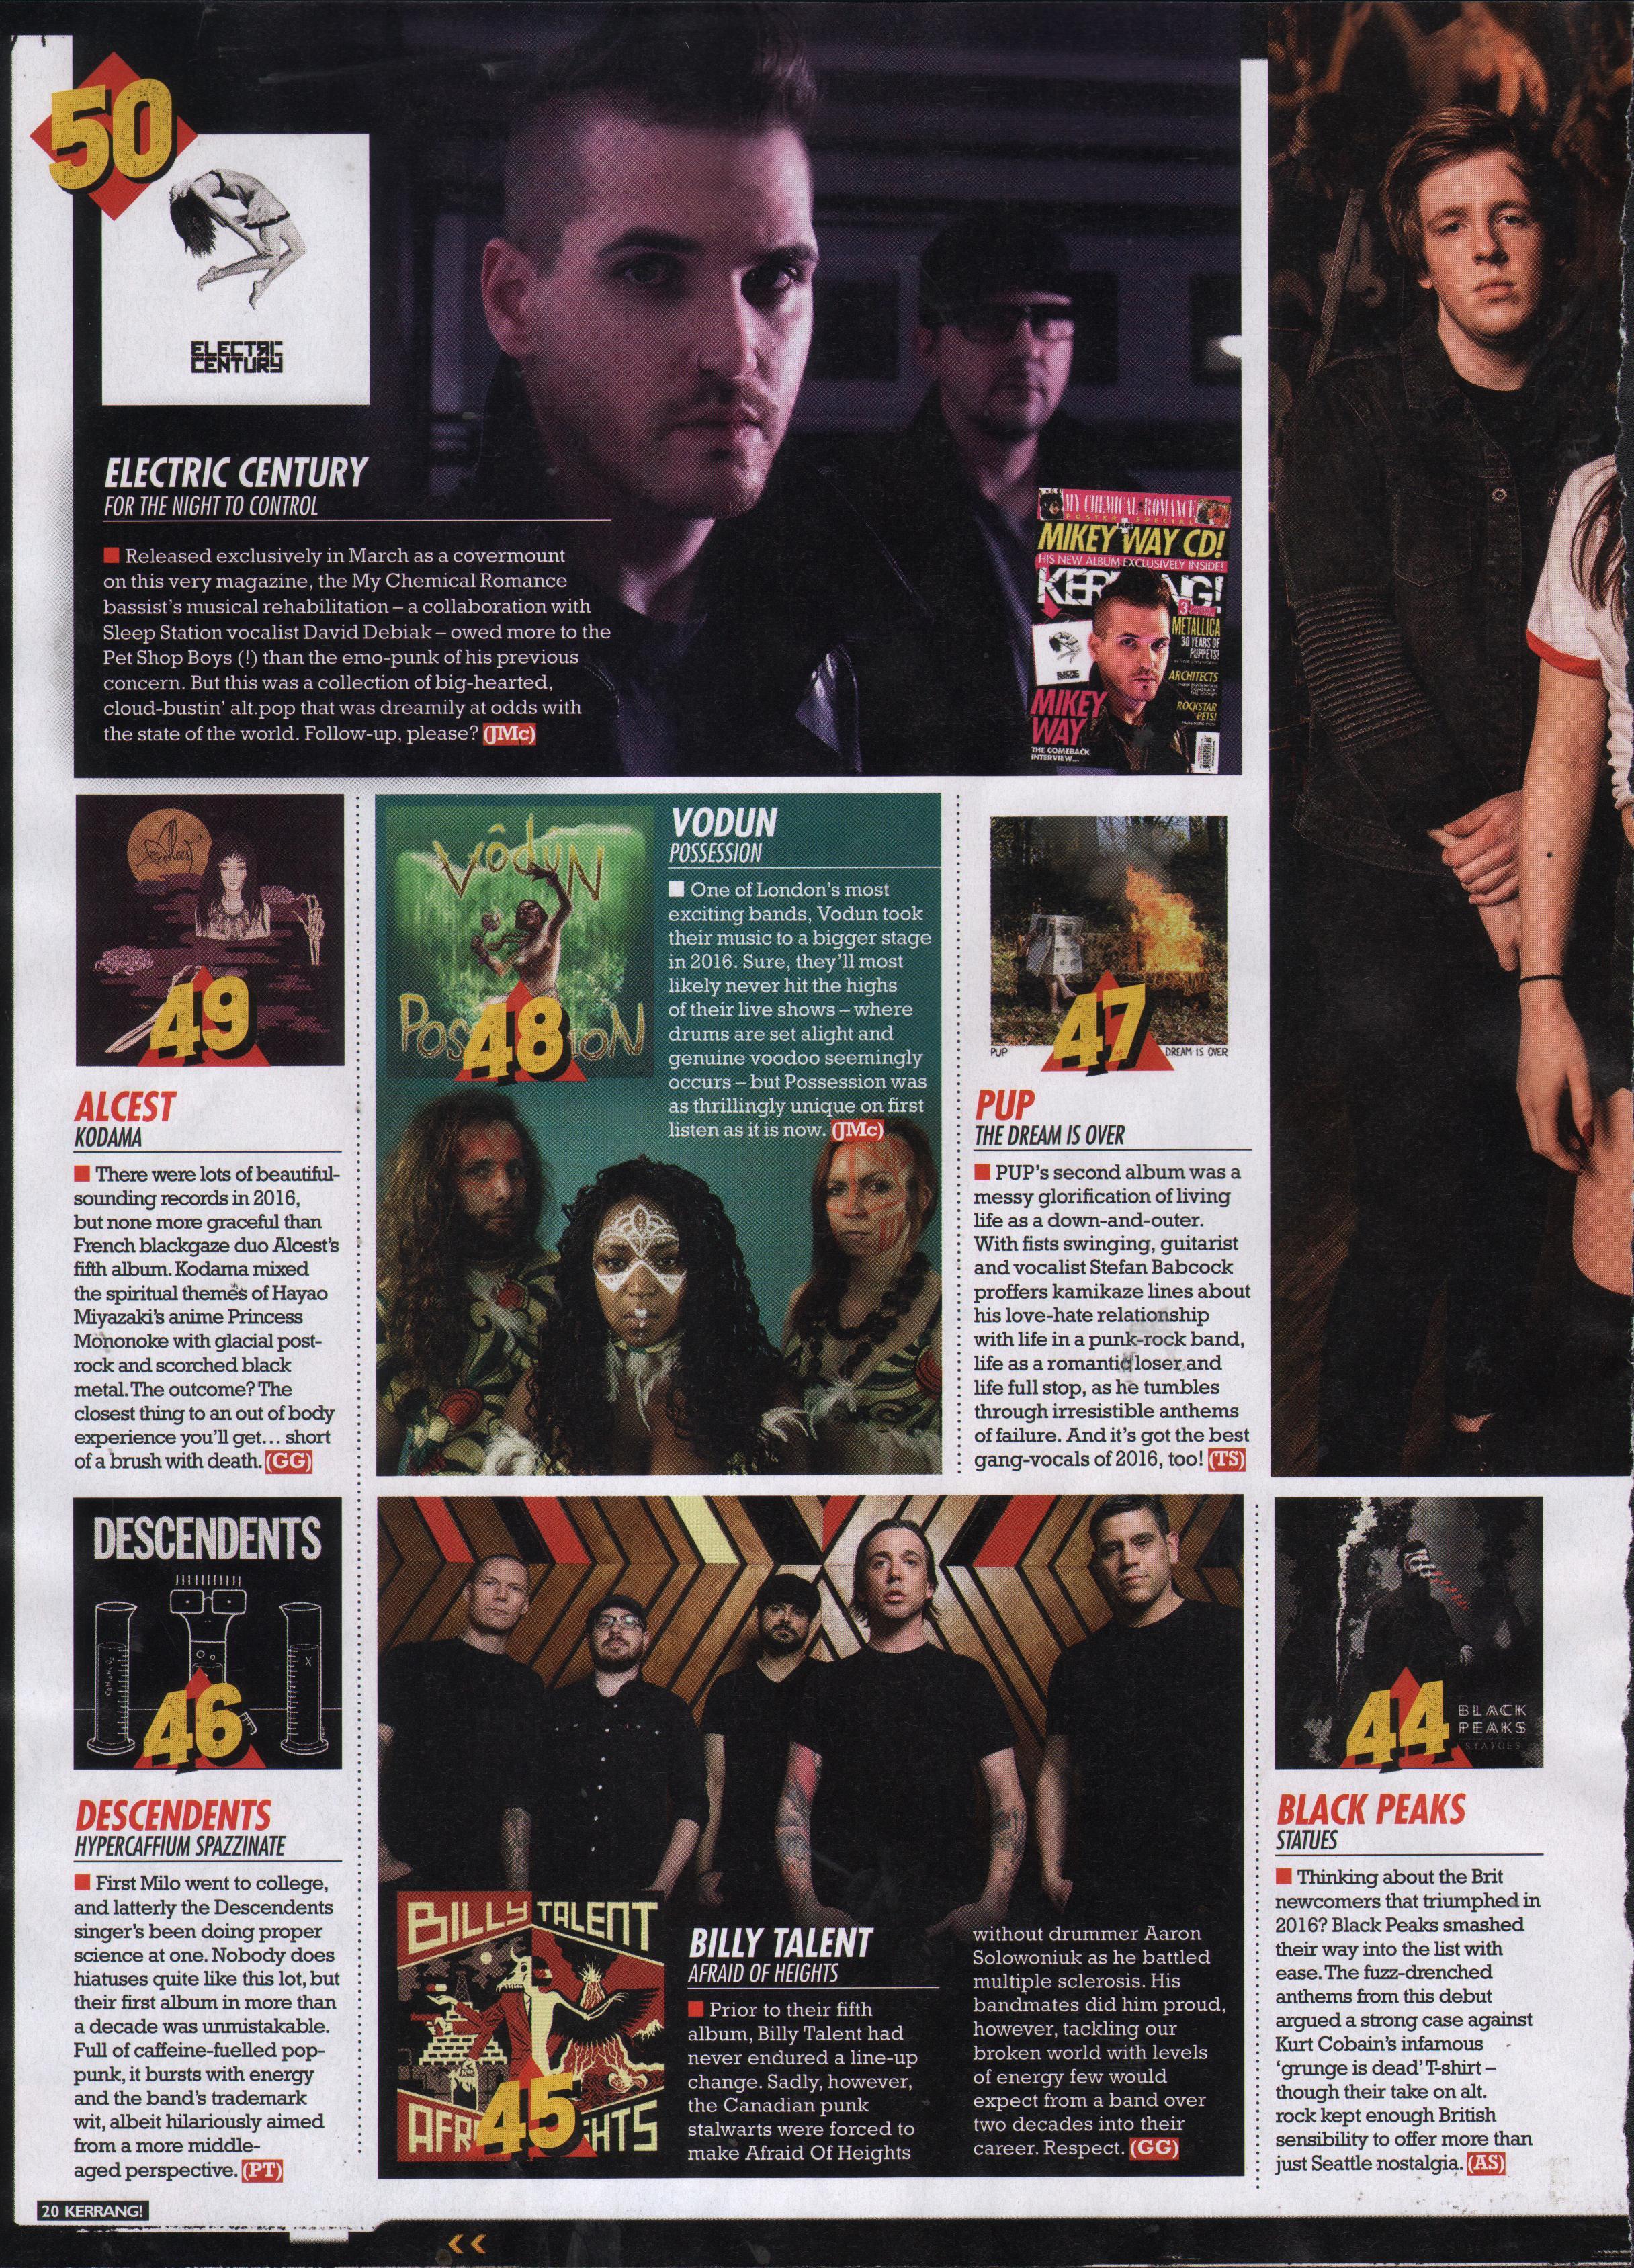 Kerrang Top 50 band of the year 2016